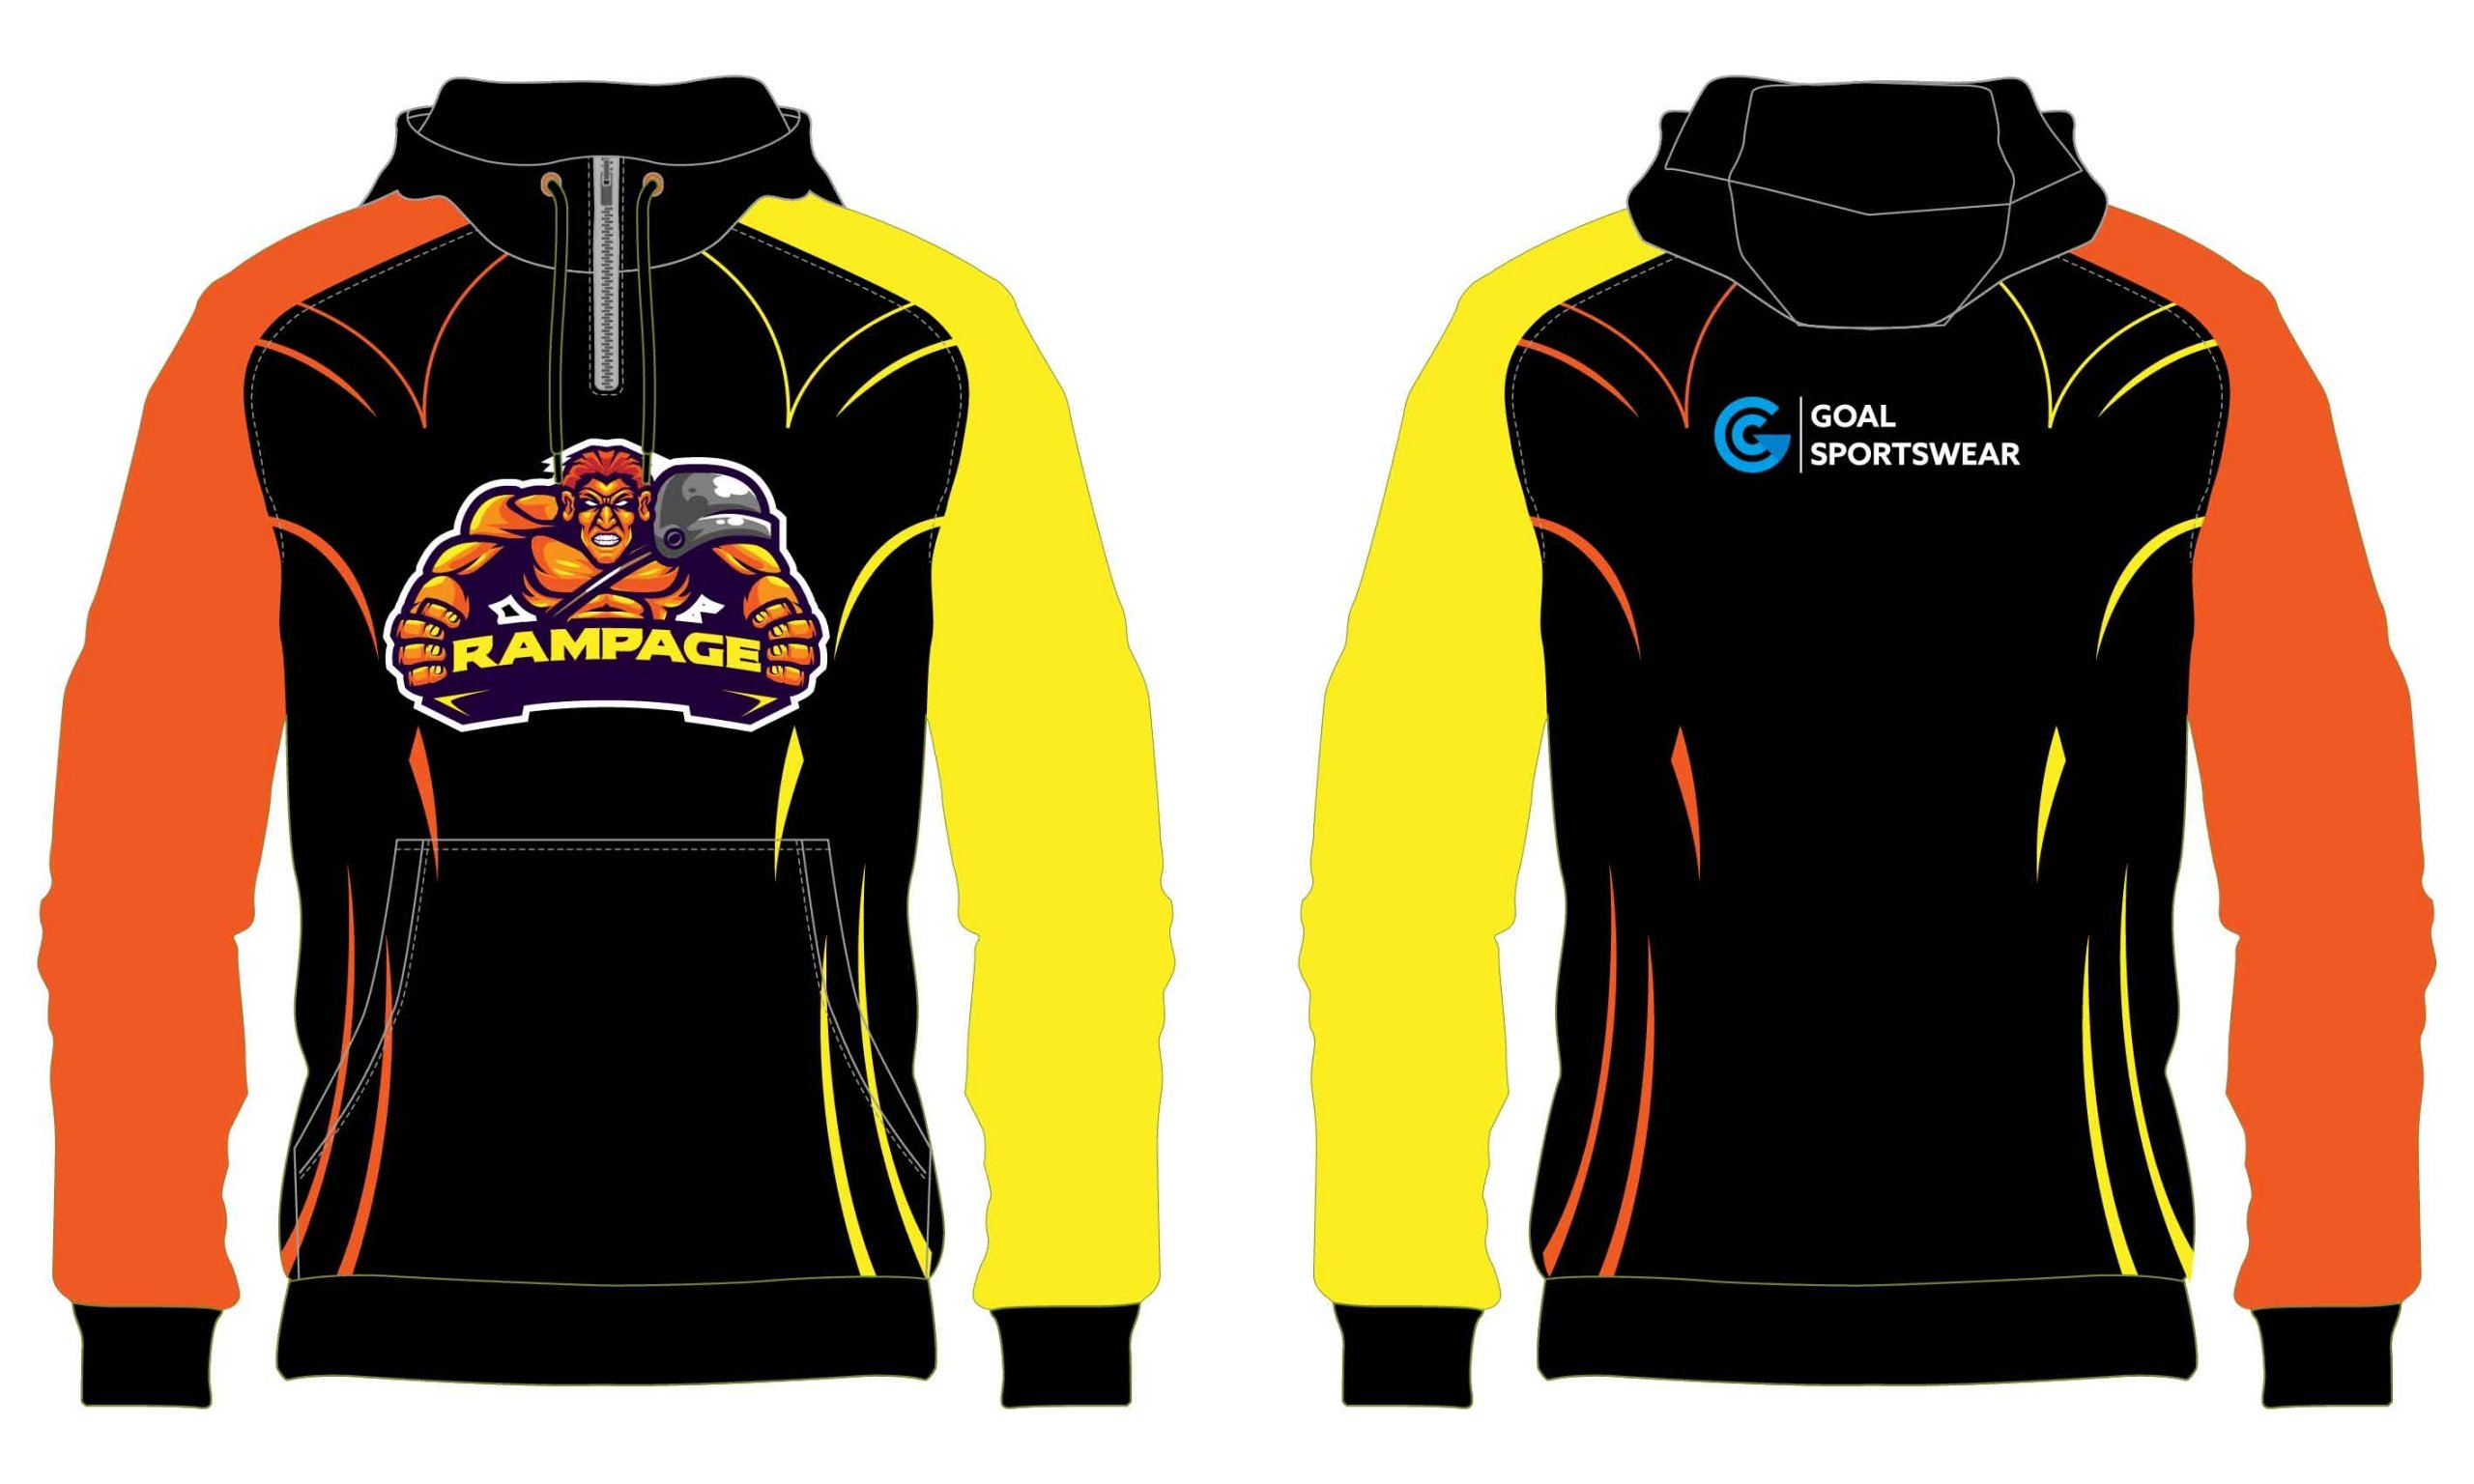 Sublimation printing 100% polyester dry fit custom wrestling sweatshirts